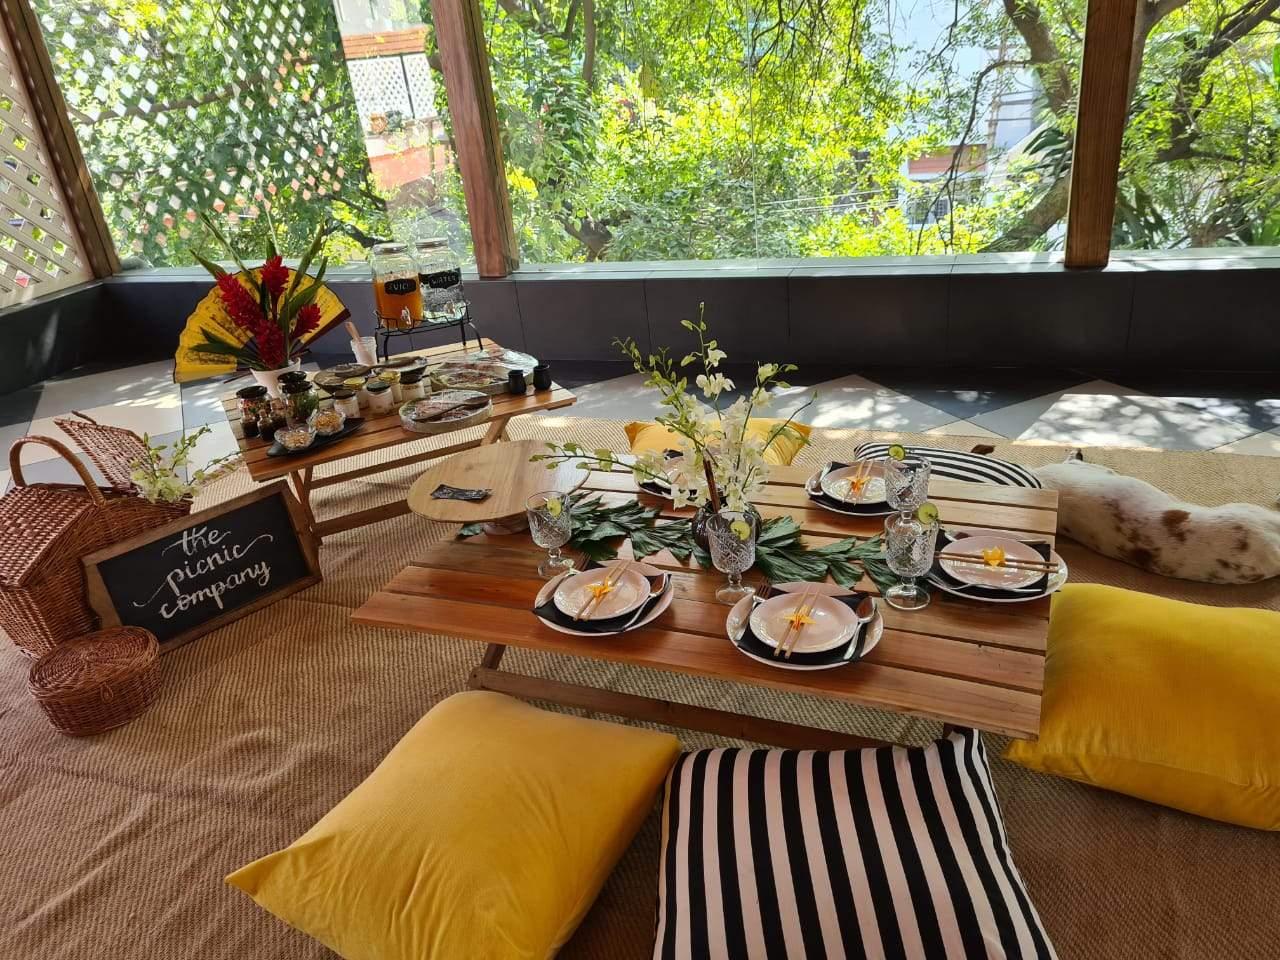 picnic set up themed restaurant